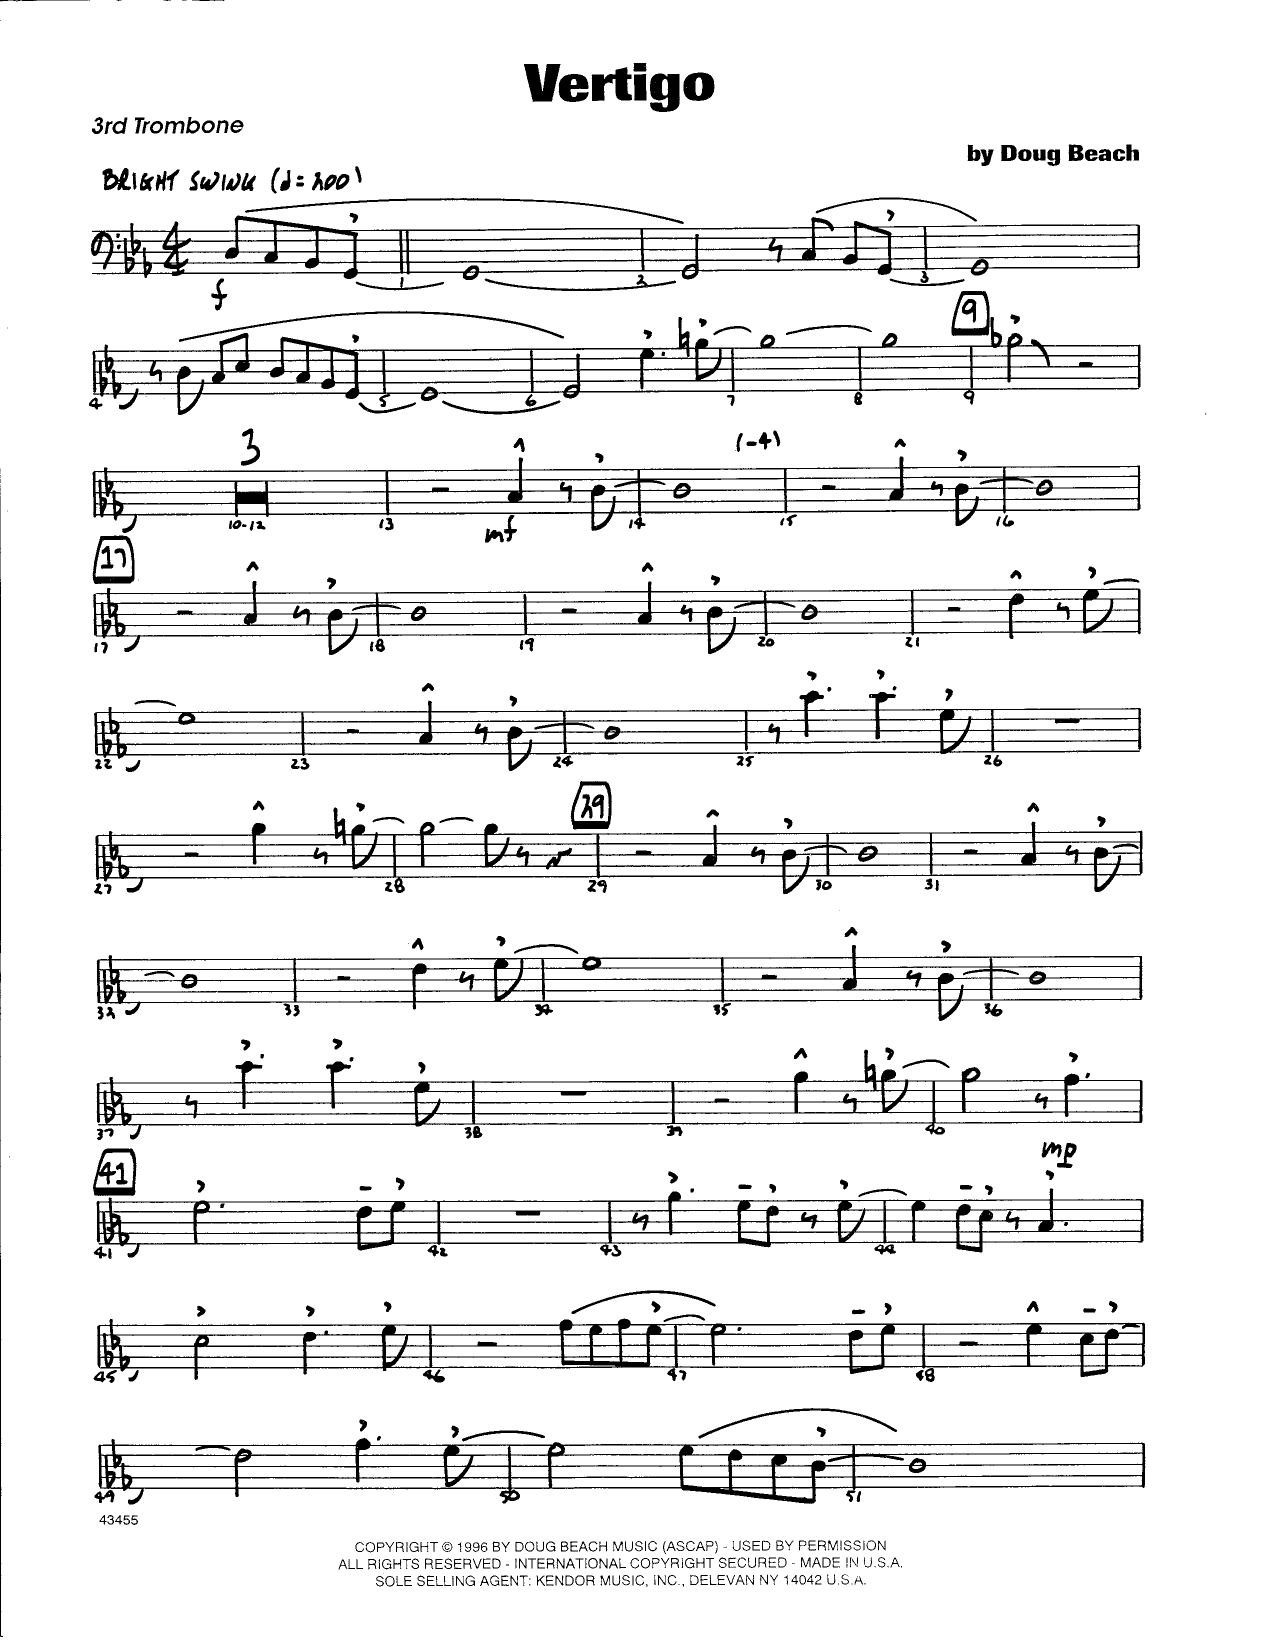 Doug Beach Vertigo - 3rd Trombone sheet music notes and chords. Download Printable PDF.